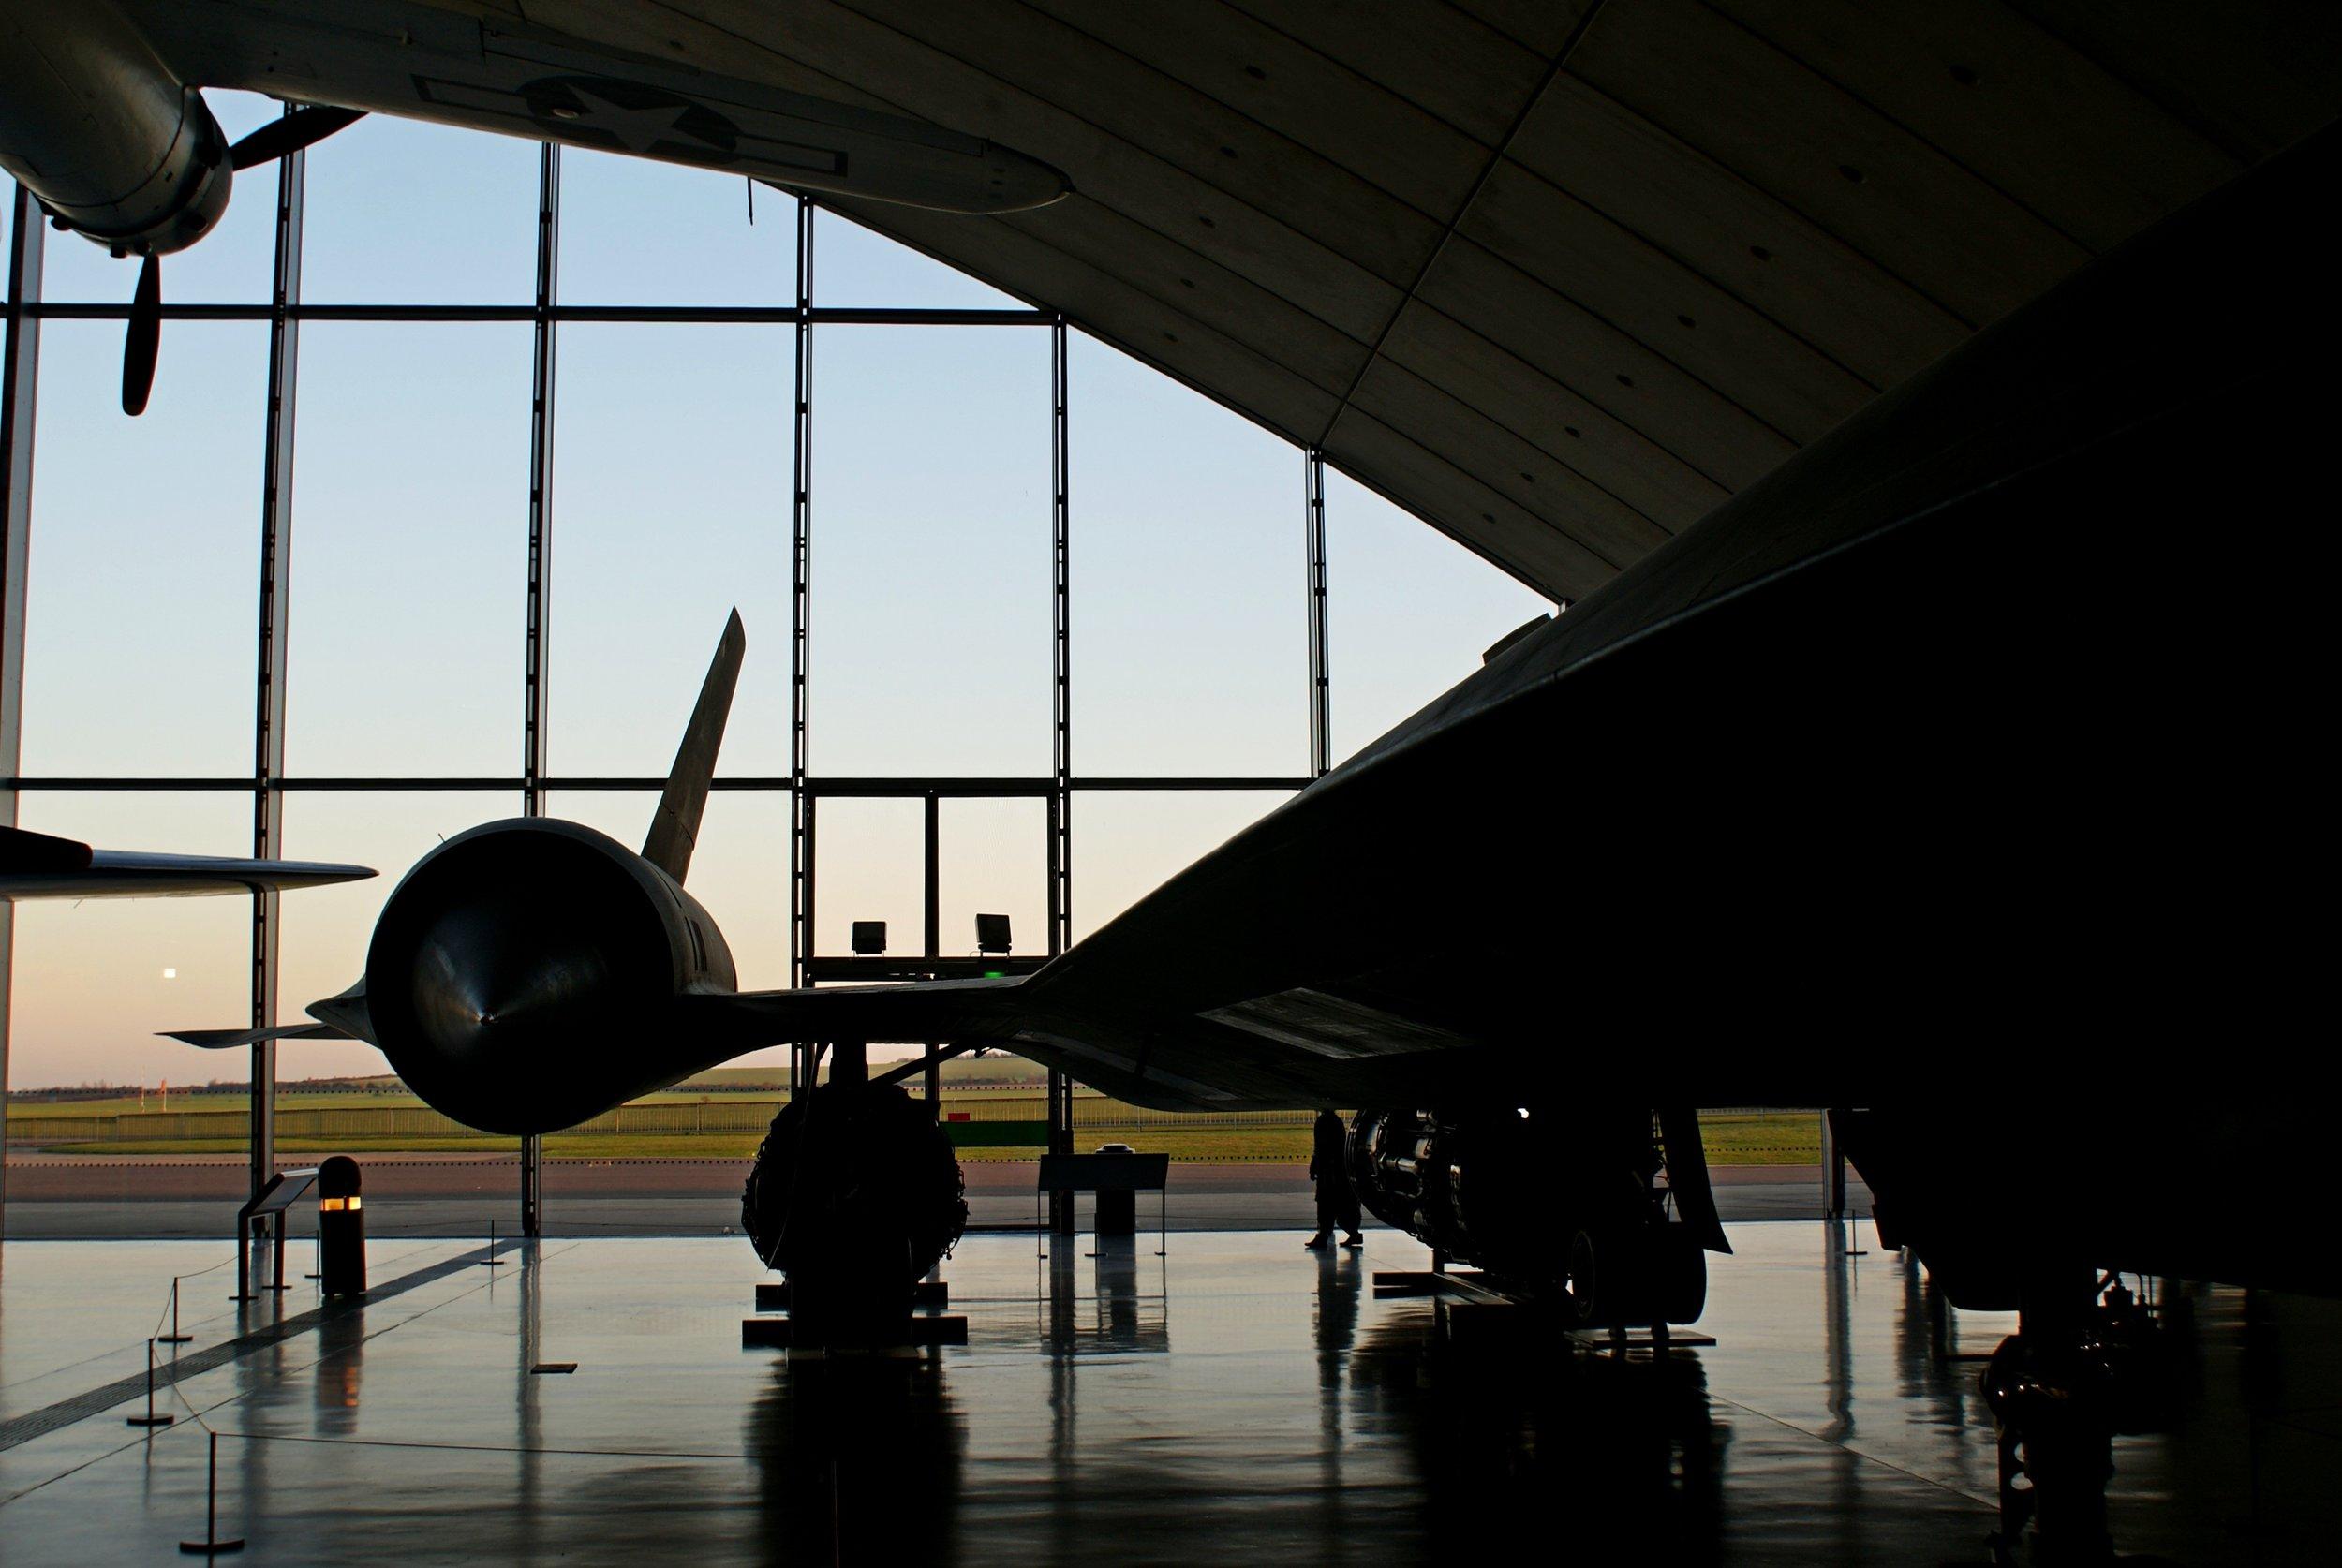 My photo of SR-71 Blackbird 962 at sunset in the American Muesum at IWM Duxford